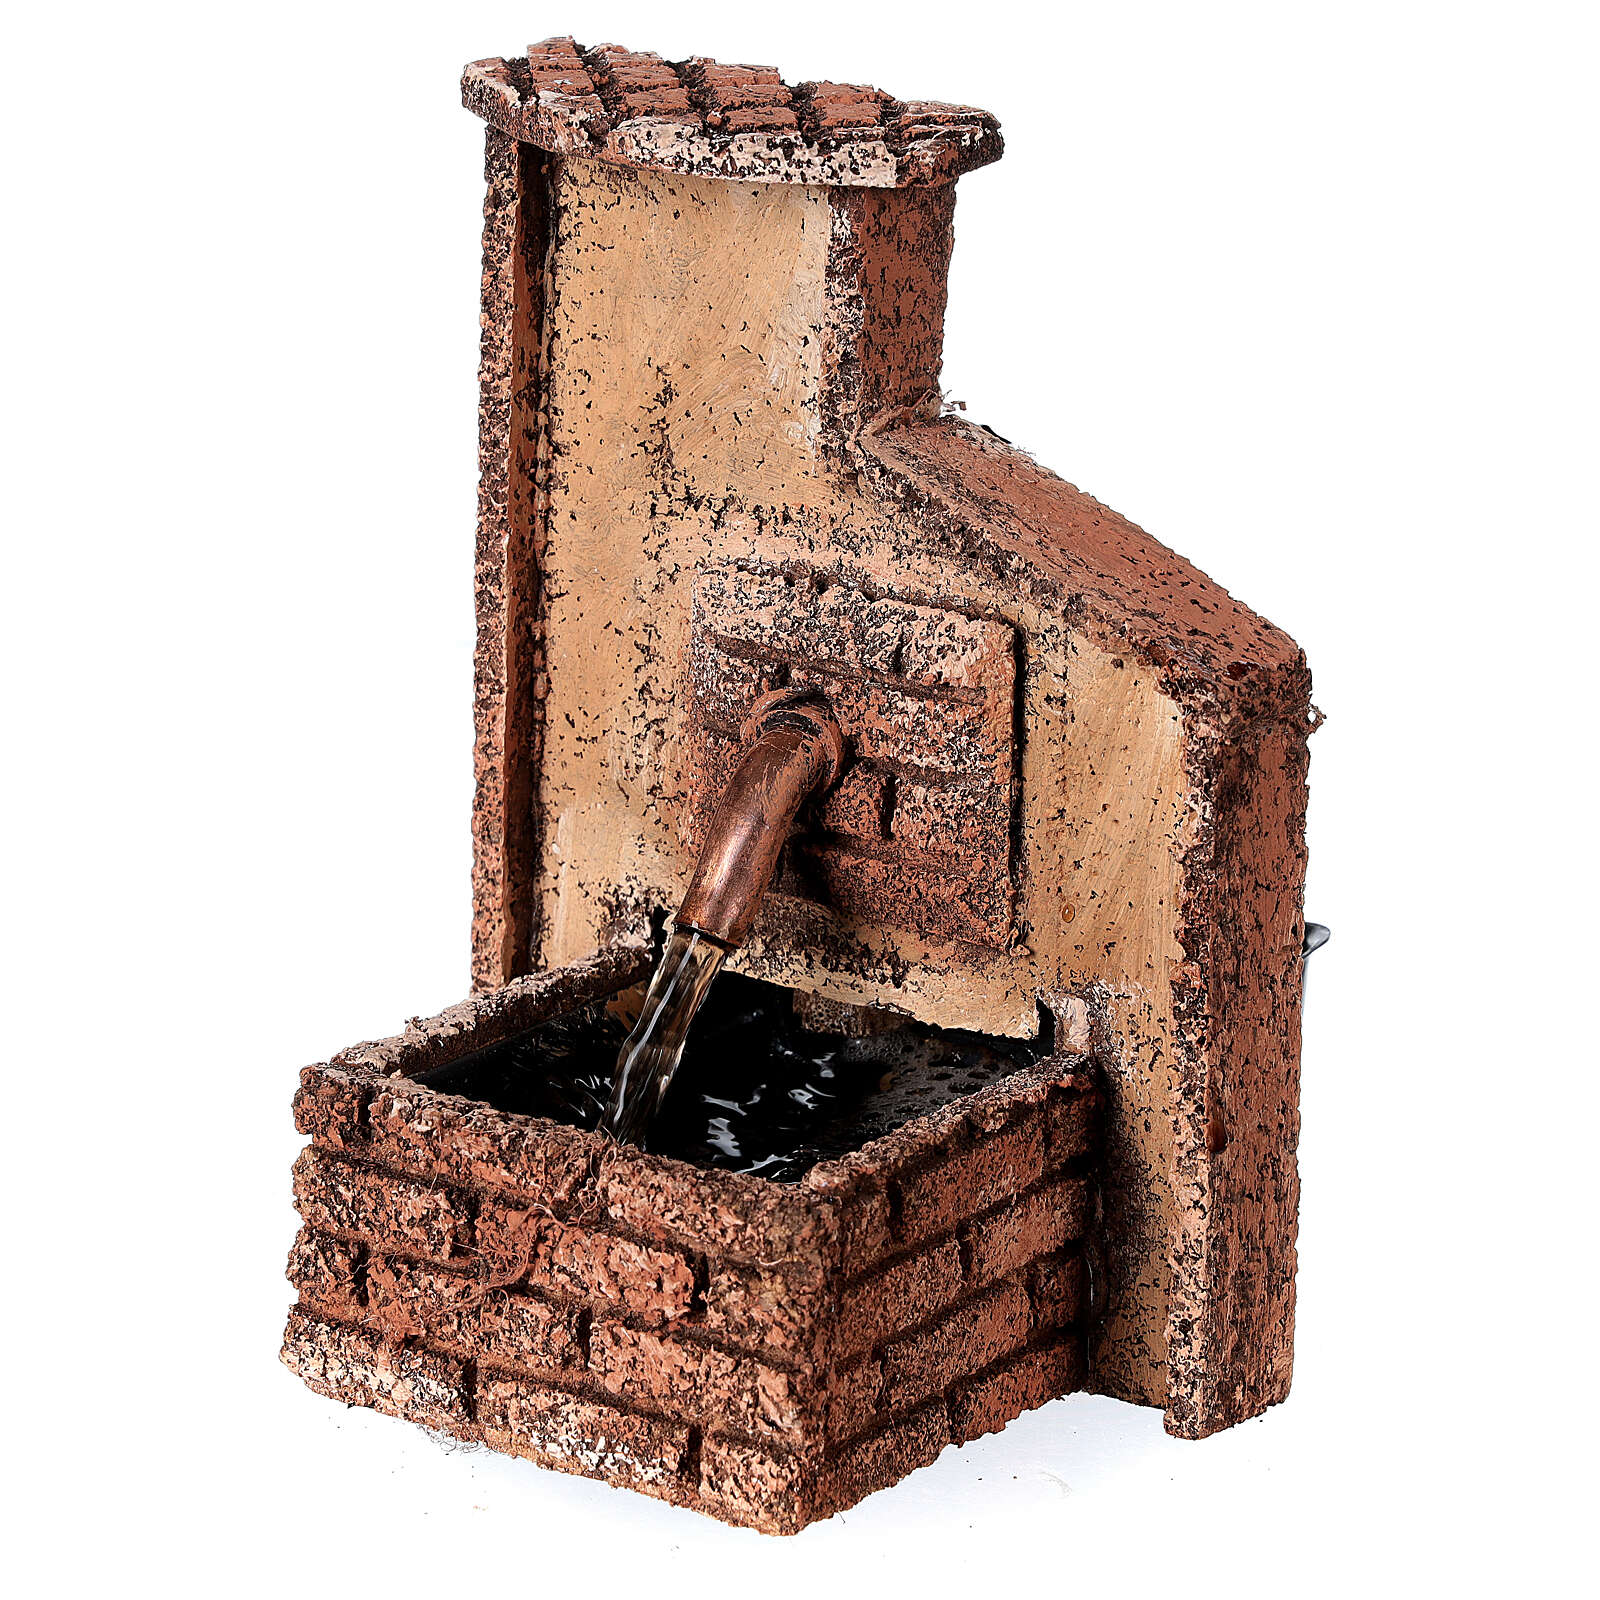 Working fountain Neapolitan Nativity scene 10-12 cm cork 15x10x10 cm 4